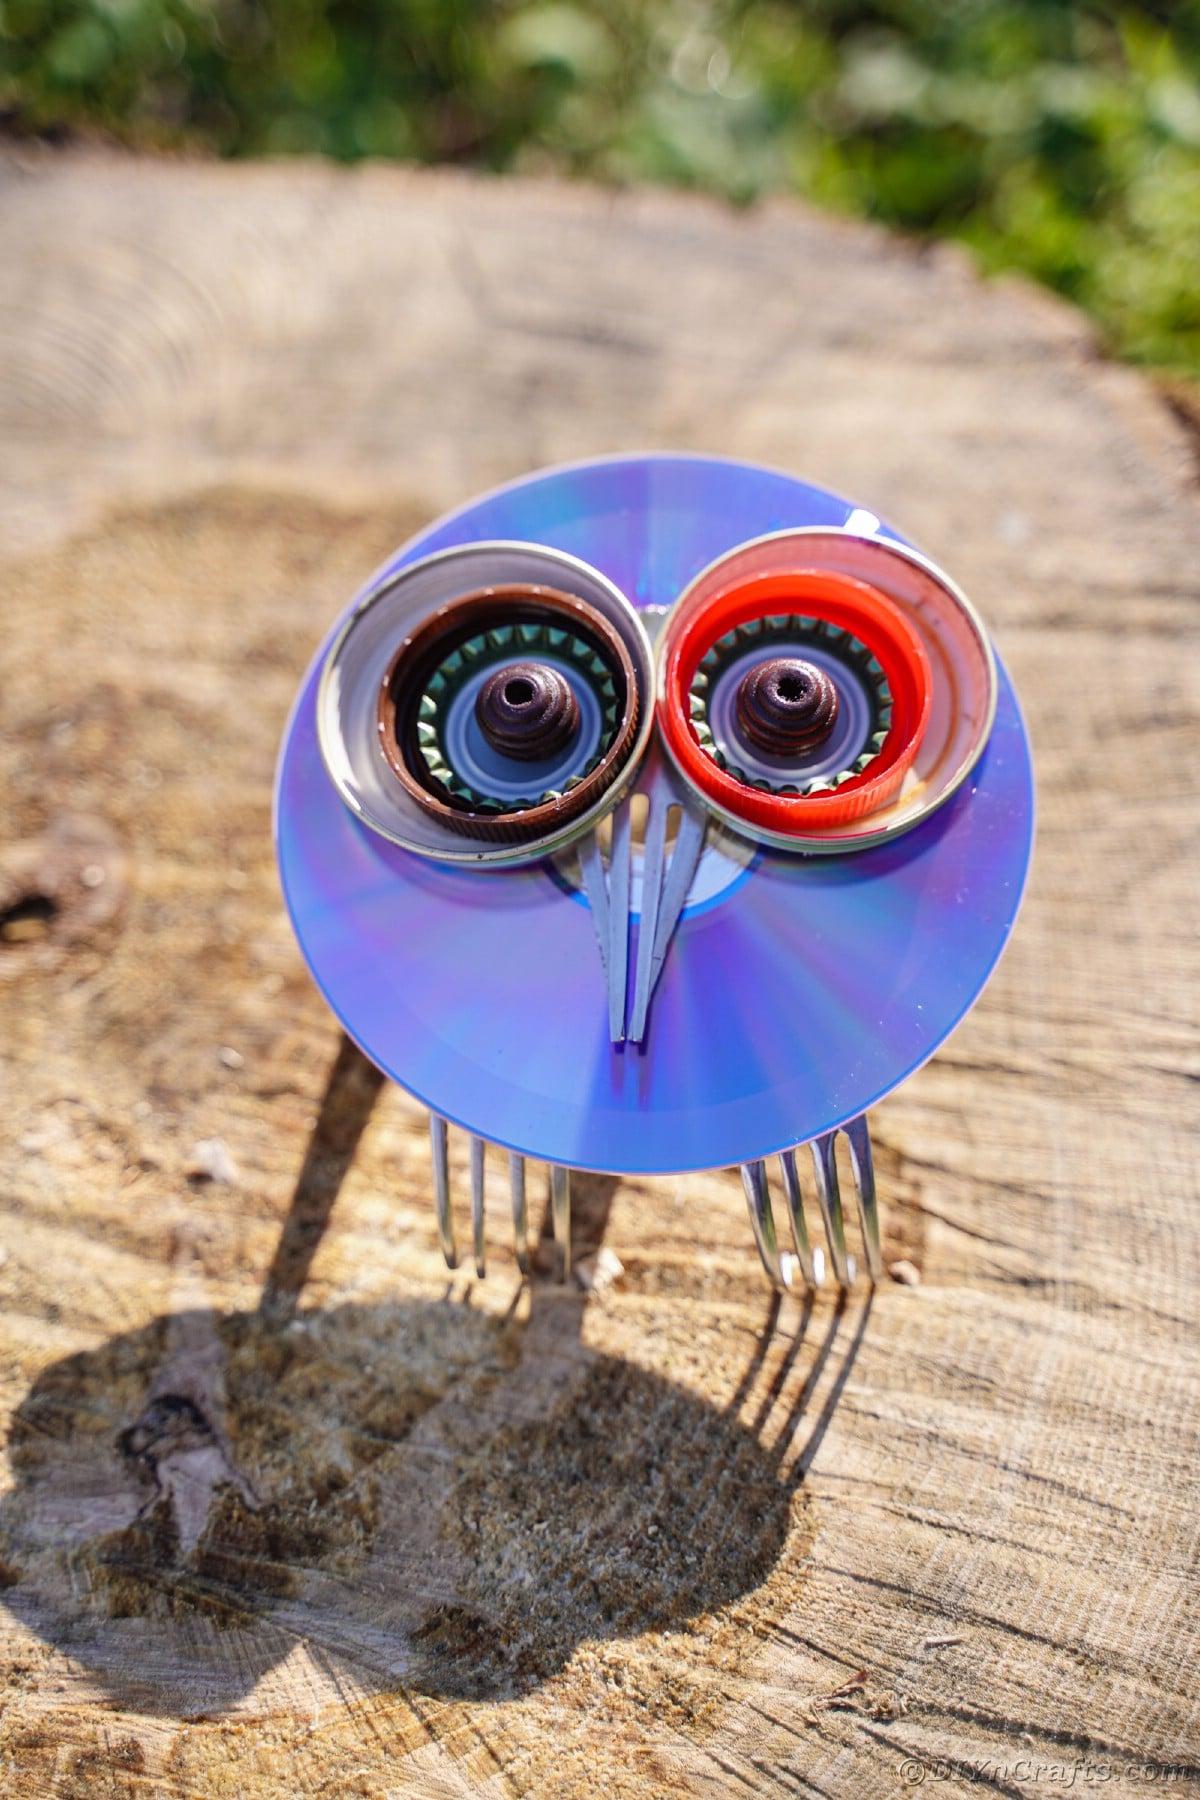 Colorful CD owl sittin gon wooden stump